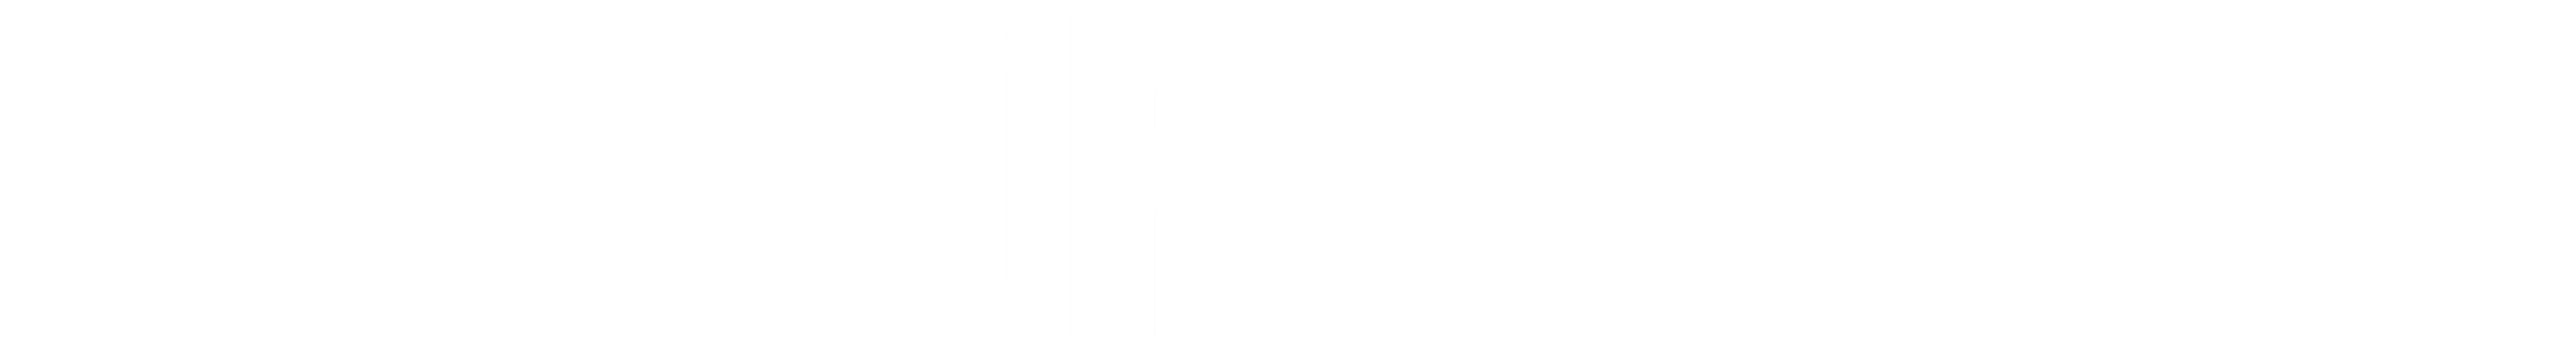 FFSBD LOGO APAISAT SENSE DATA SENSE CLAIM ALTA png